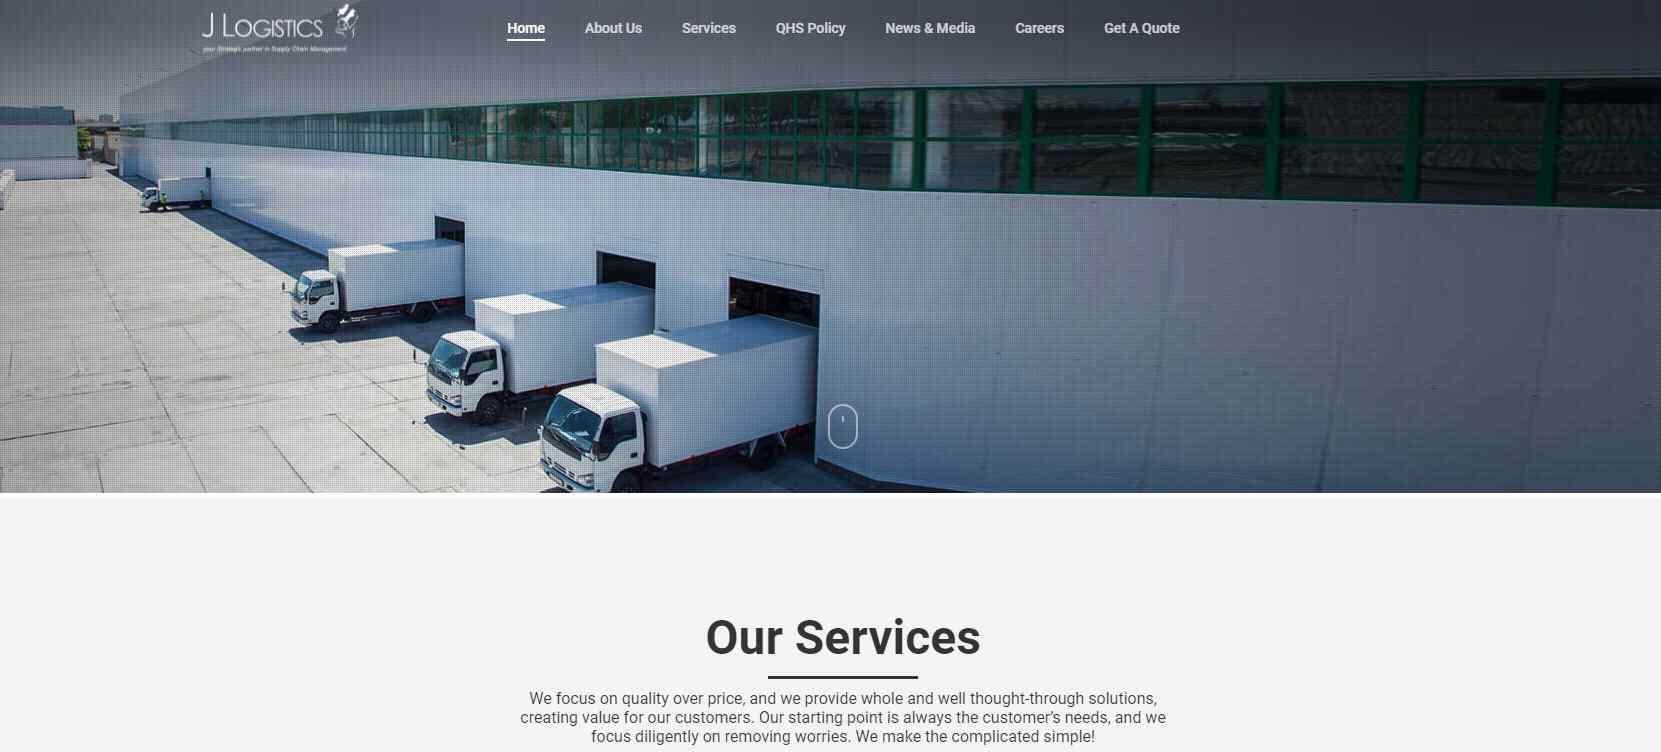 j logistics Top Logistics Companies in Singapore